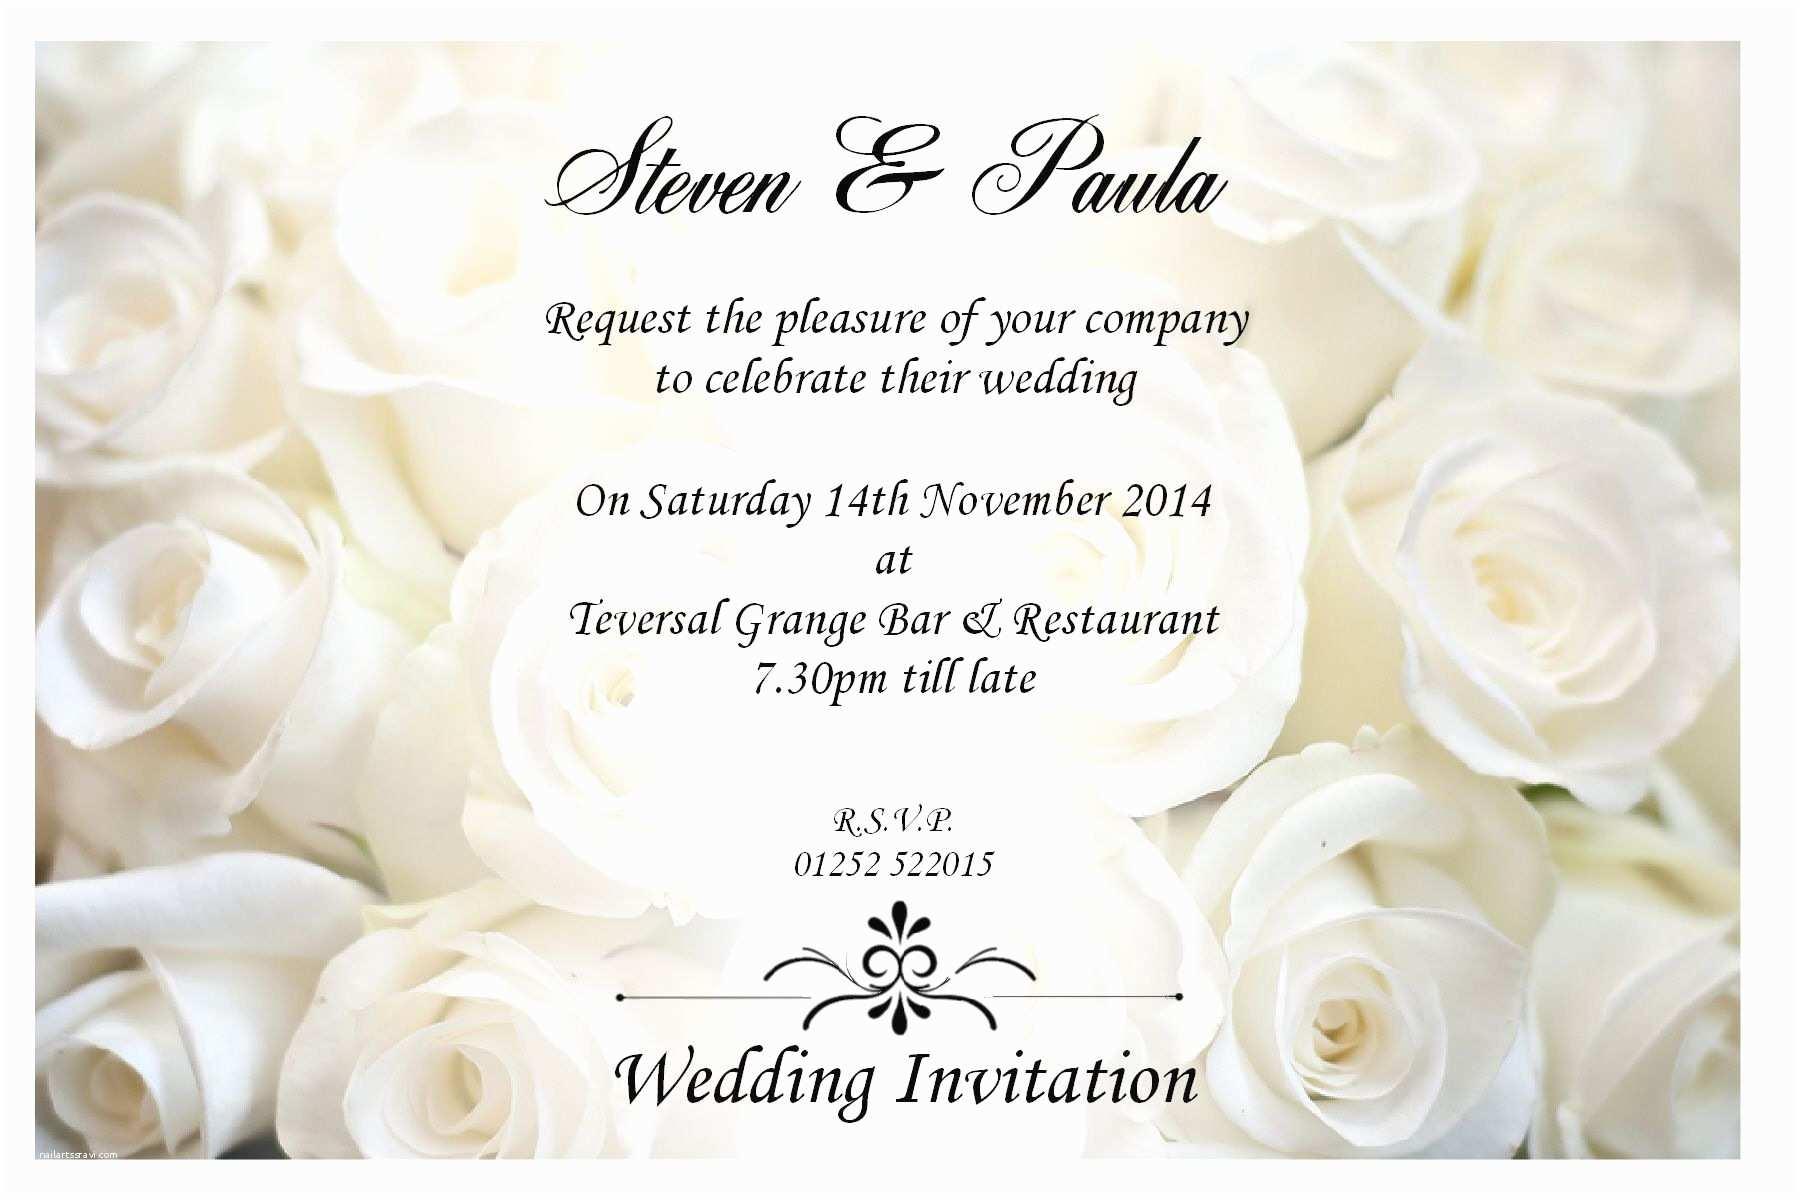 A Wedding Invitation Sample Wedding Invitation by Email